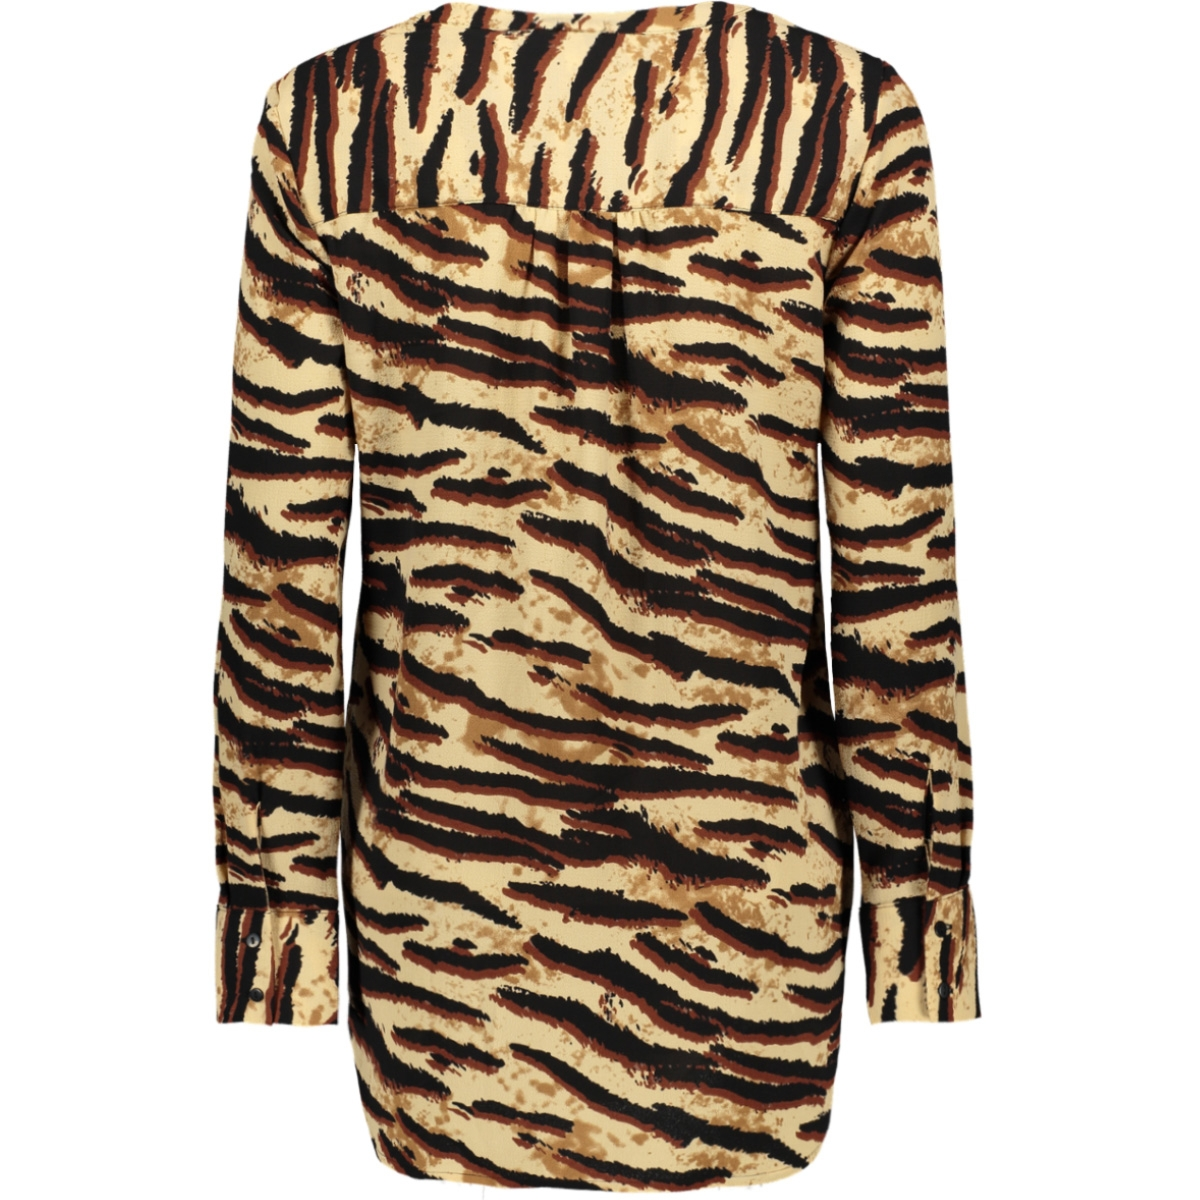 vmsaga ls tunic 10201931 vero moda blouse tobacco brown/tiffany